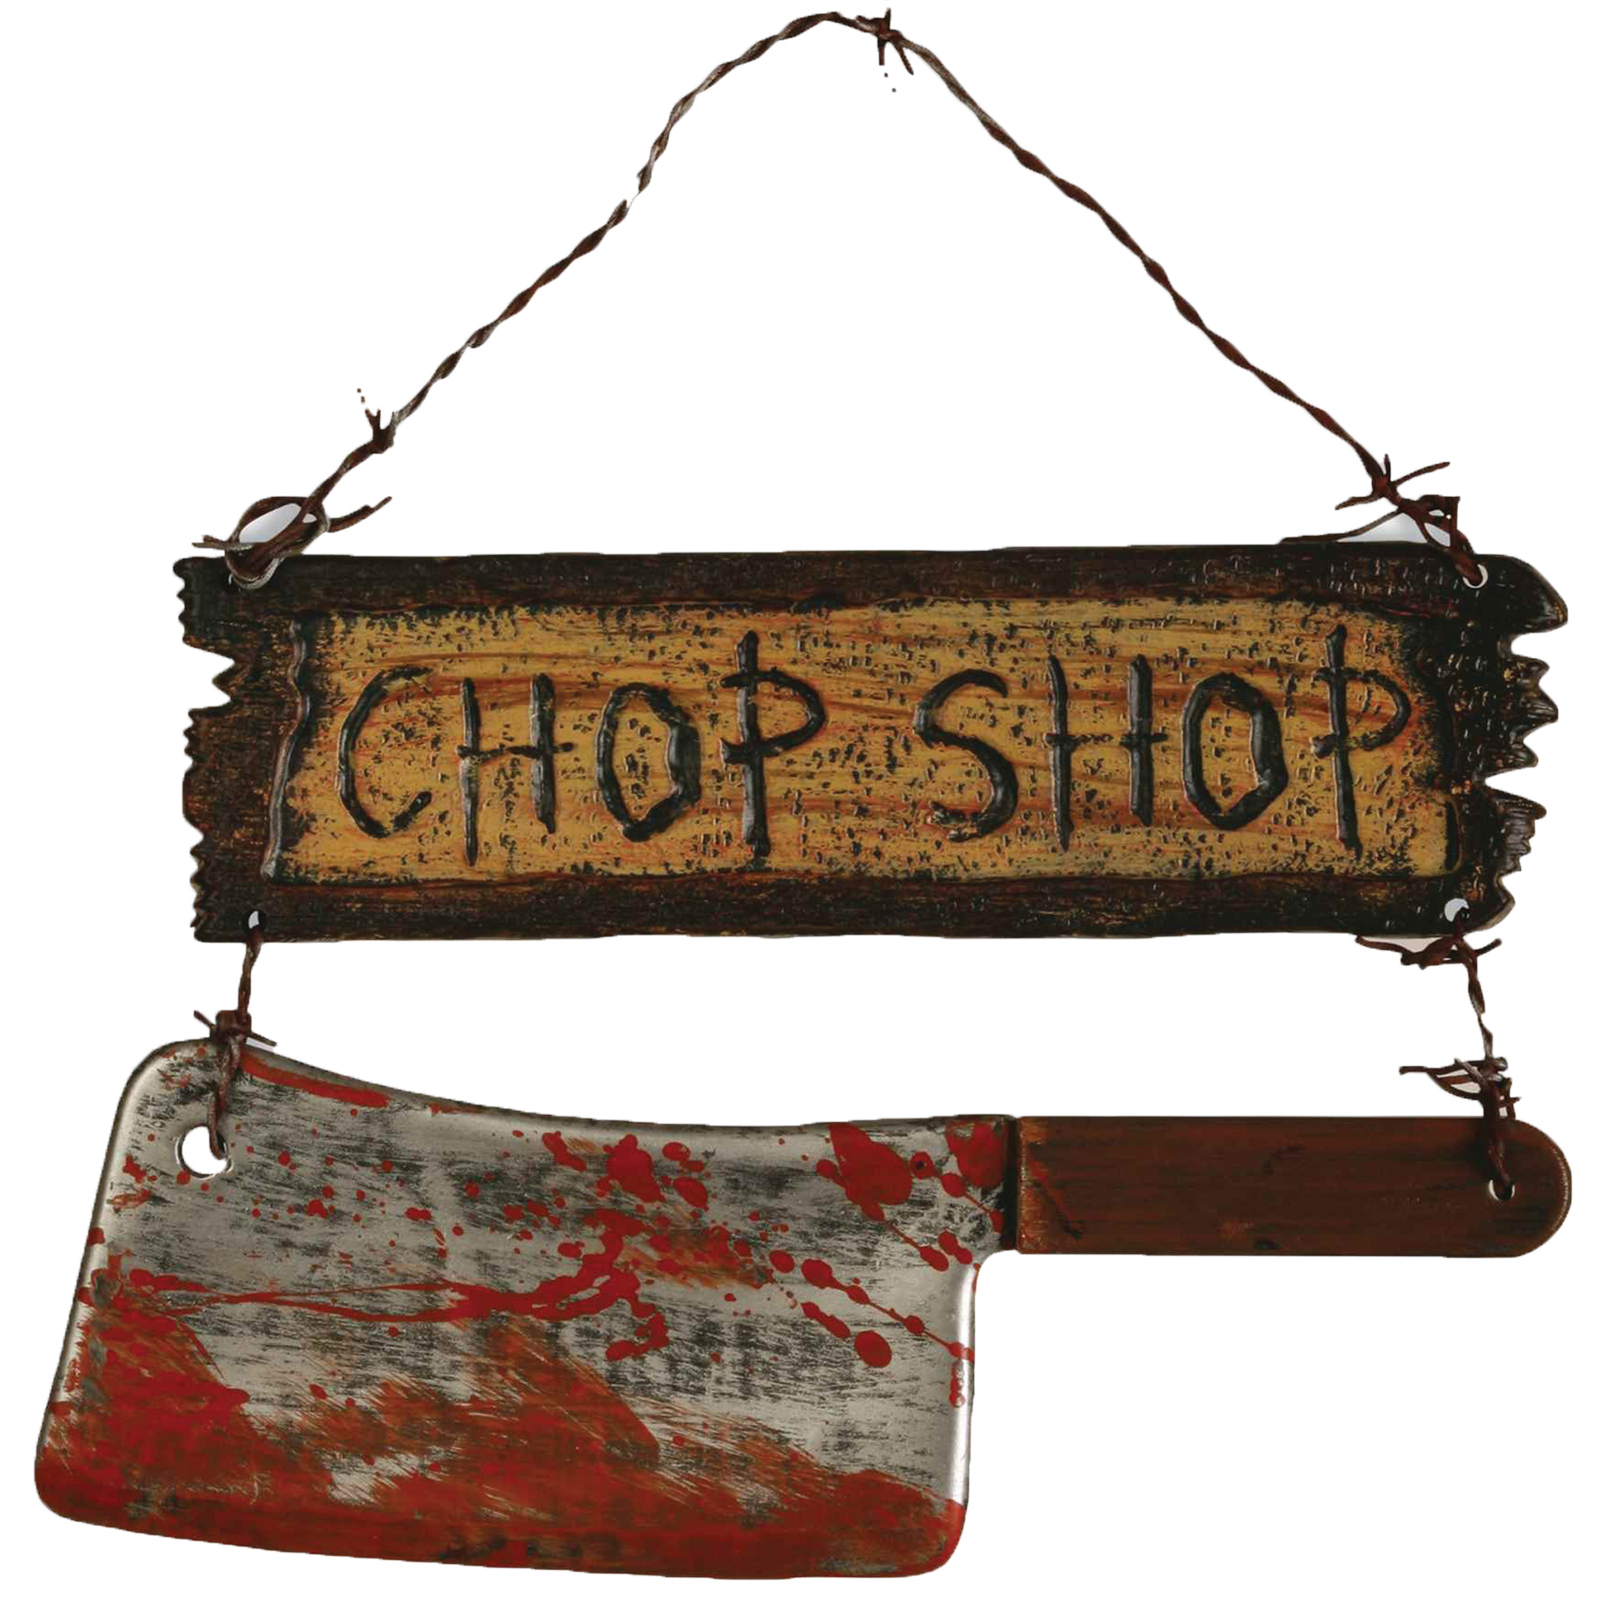 Morris Costumes Chop Shop Sign PartNumber: 05029905000P